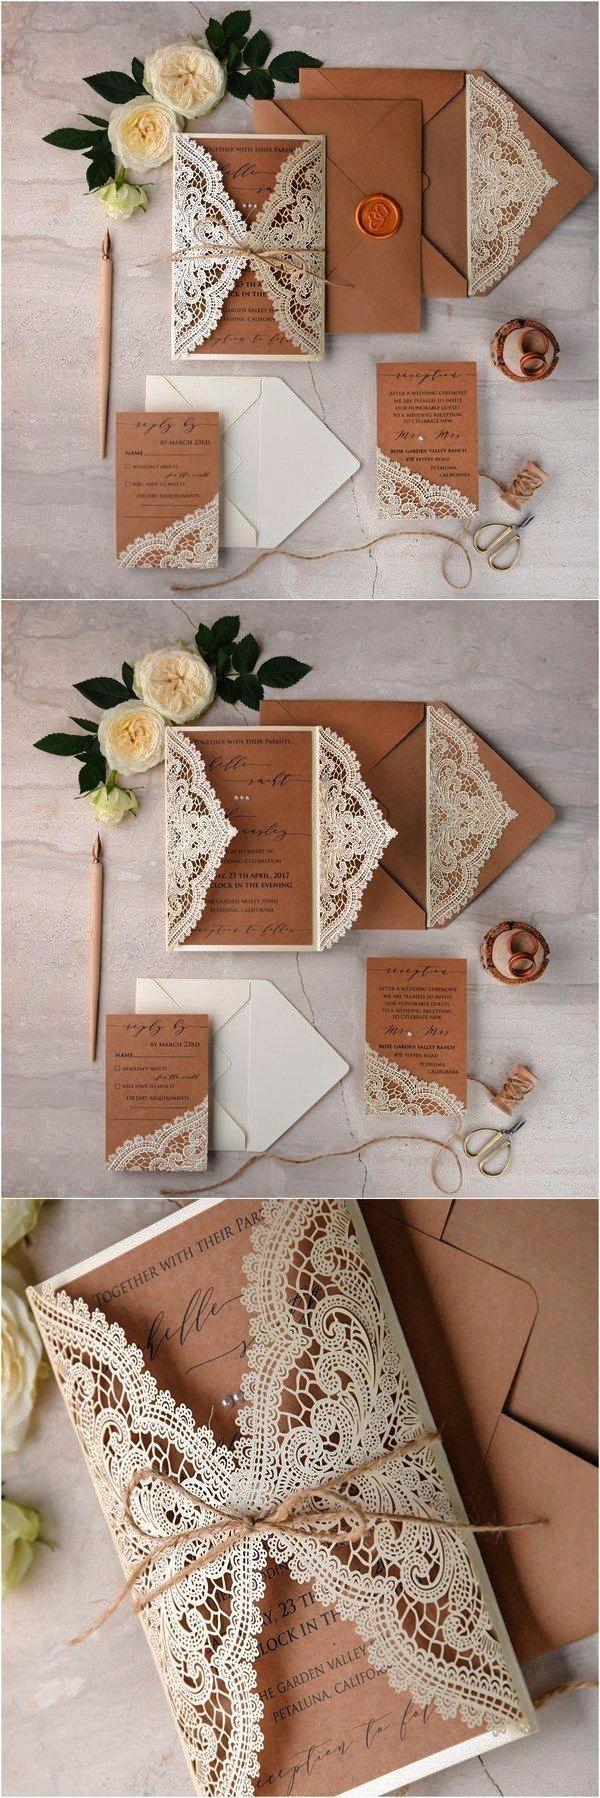 Wedding decorations theme october 2018 Funny Wedding Cards Amazon DIY Wedding Invitations Step By Step